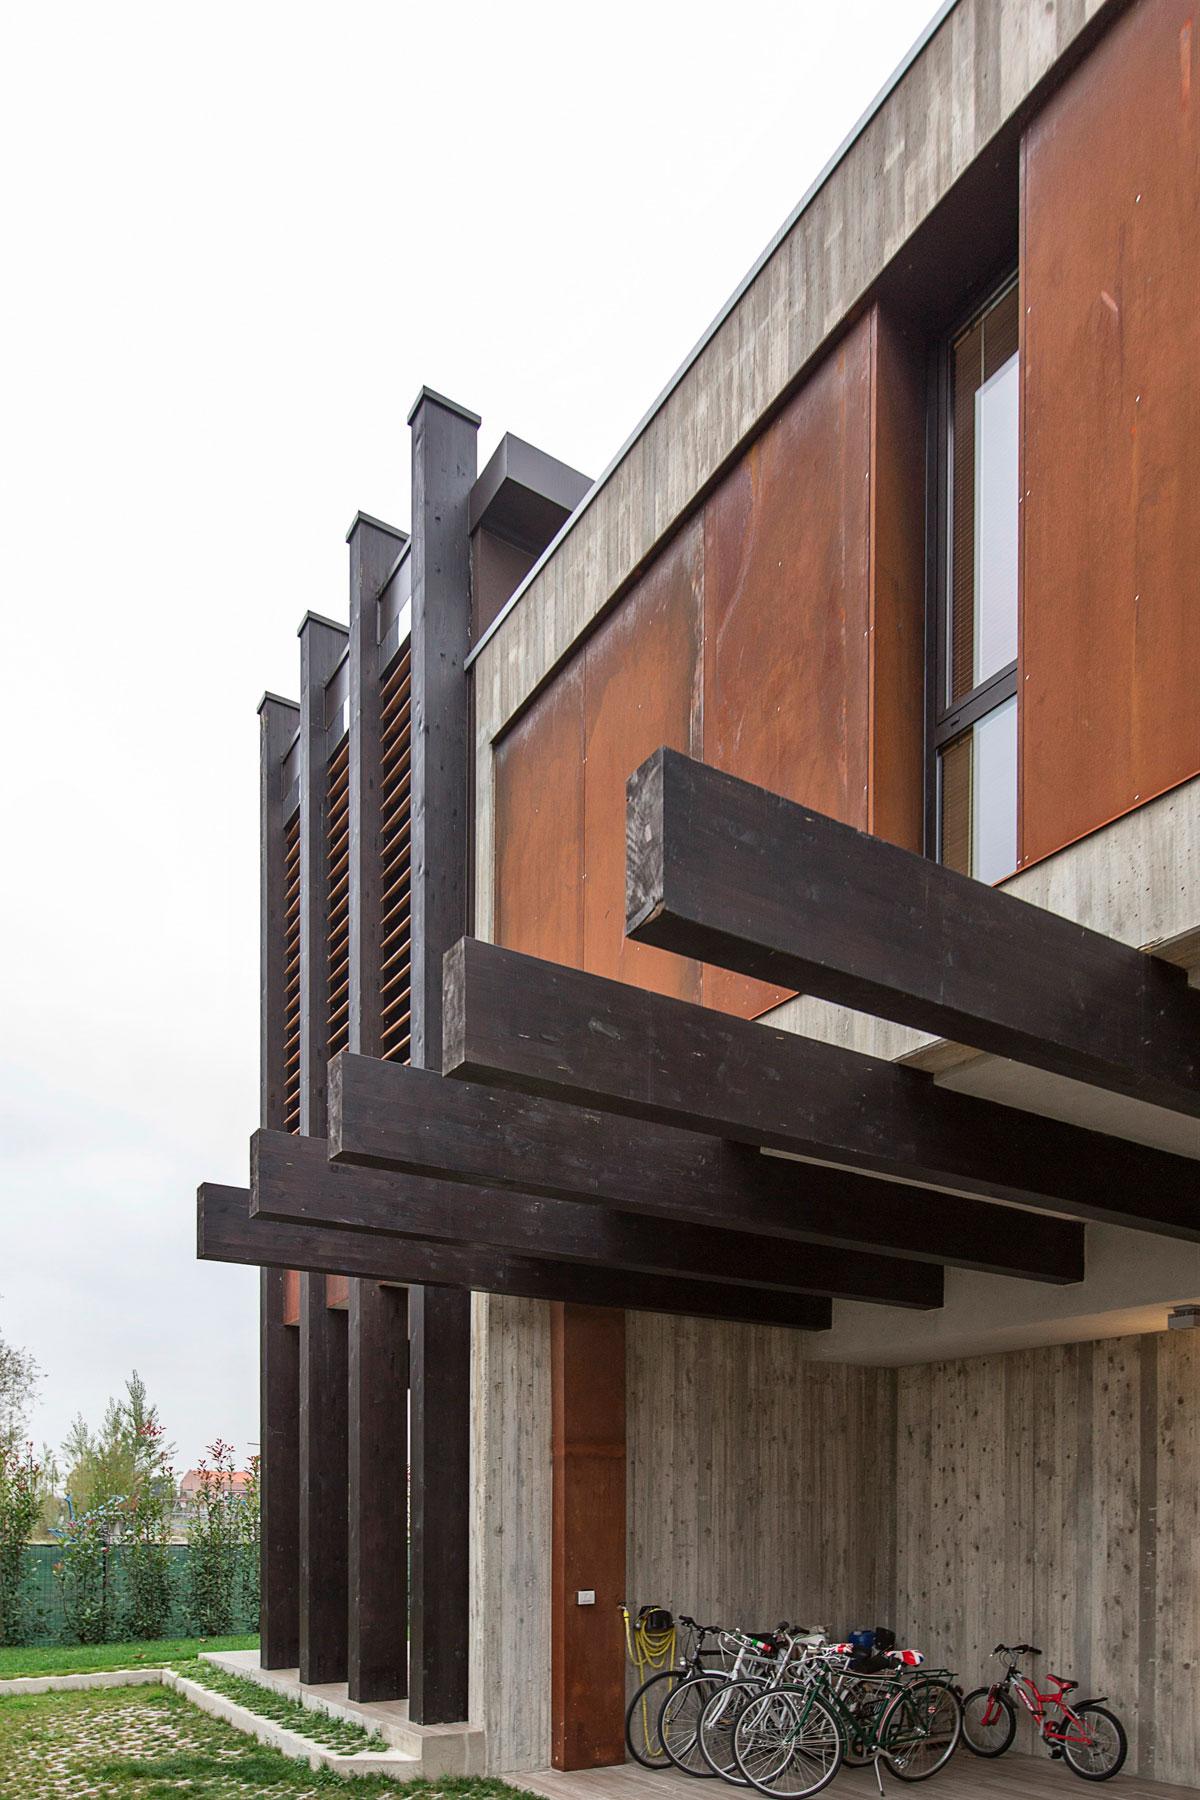 D'Autore Residence near Bologna by Giraldi Associati Architetti-05